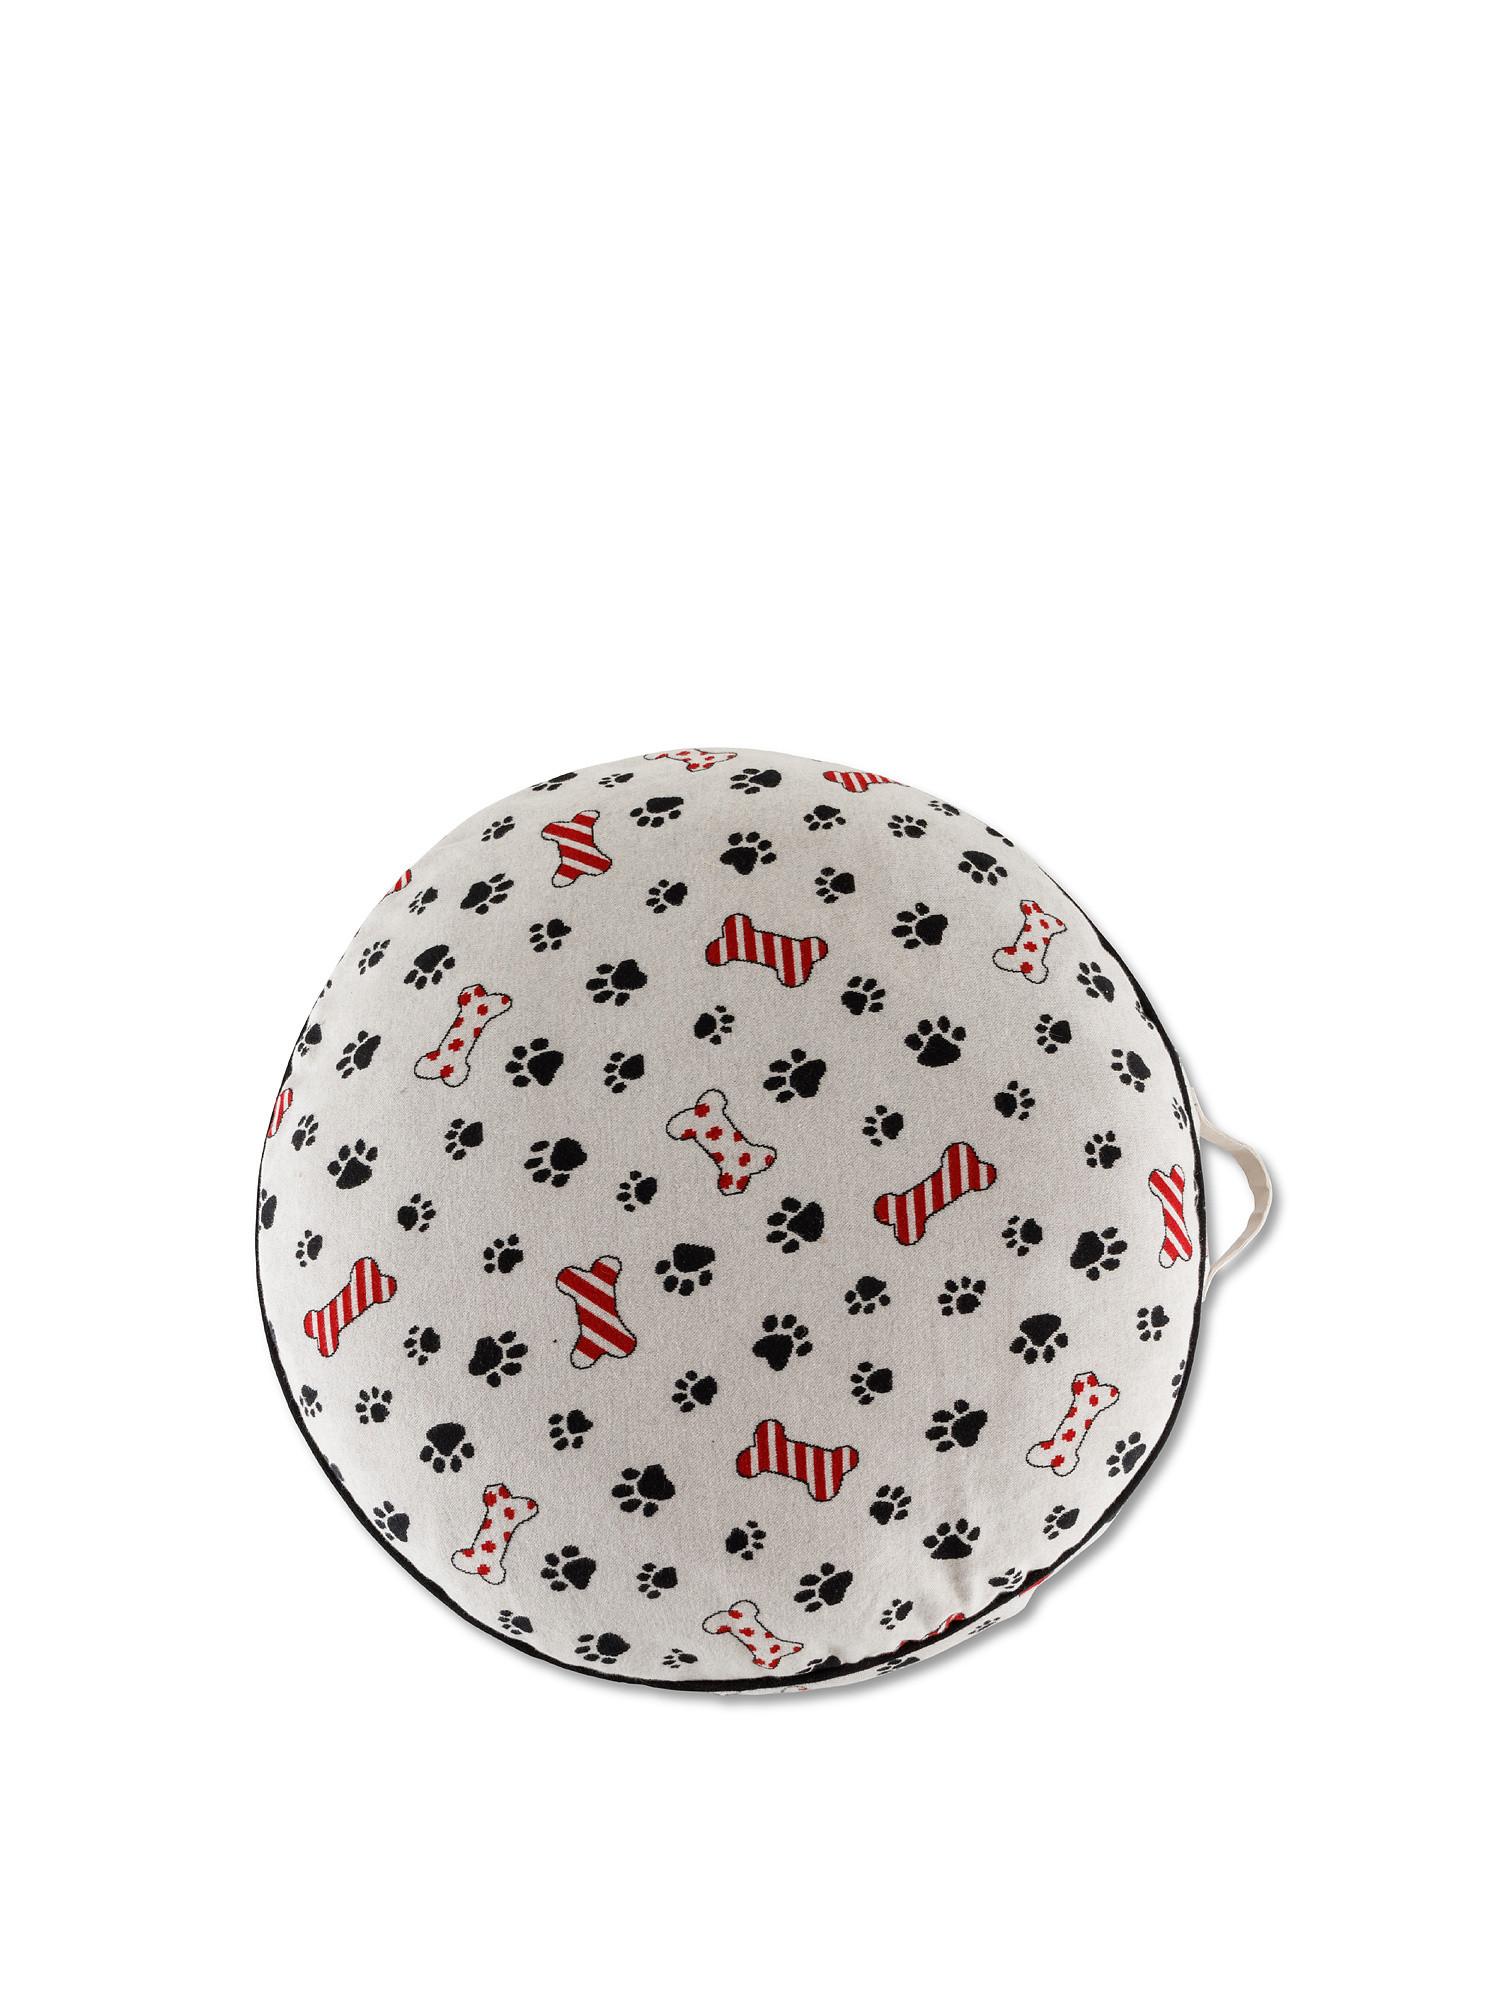 Cuscino cuccia motivo zampette, Beige chiaro, large image number 1